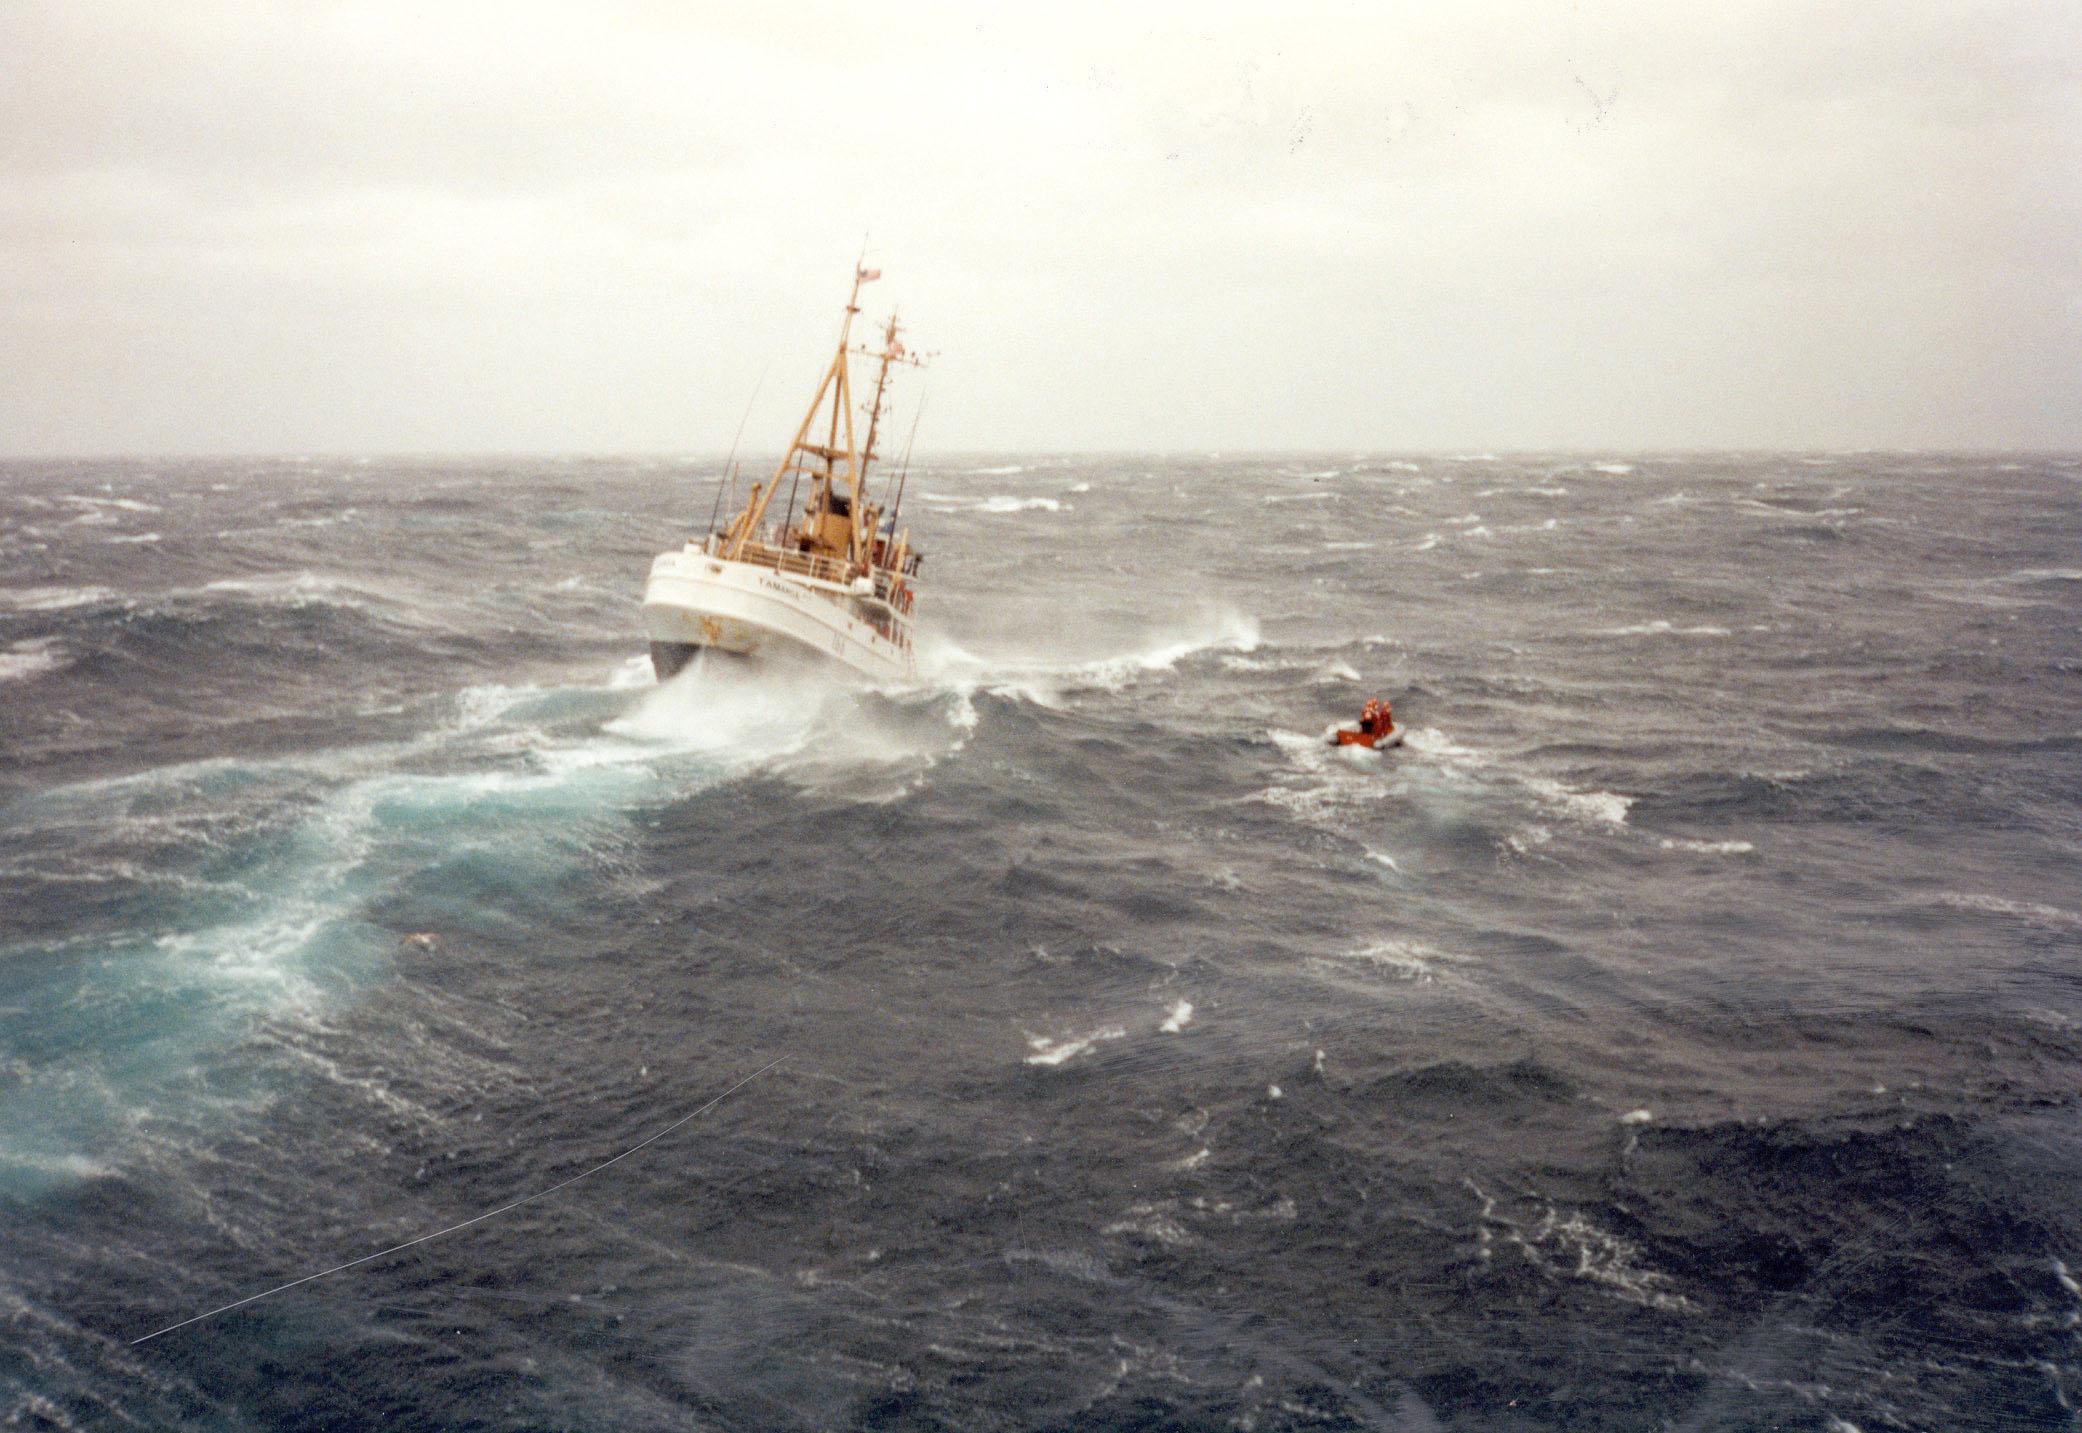 The Coast Guard cutter Tamaroa's rigid hull inflatable rescue boat,